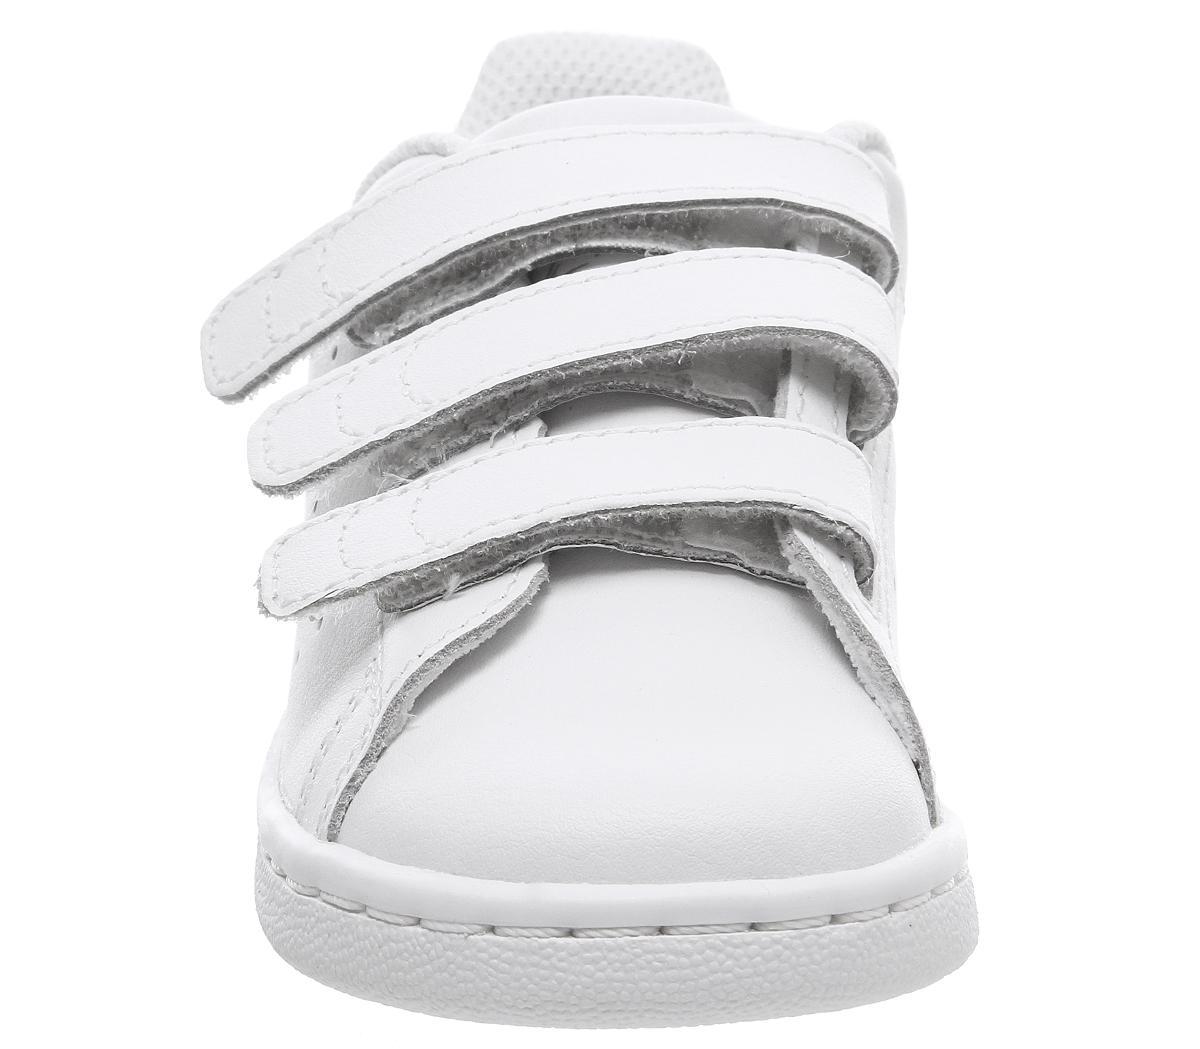 Adidas Stan Smith Cf Td 3 9 Metallic Silver The Best Seller